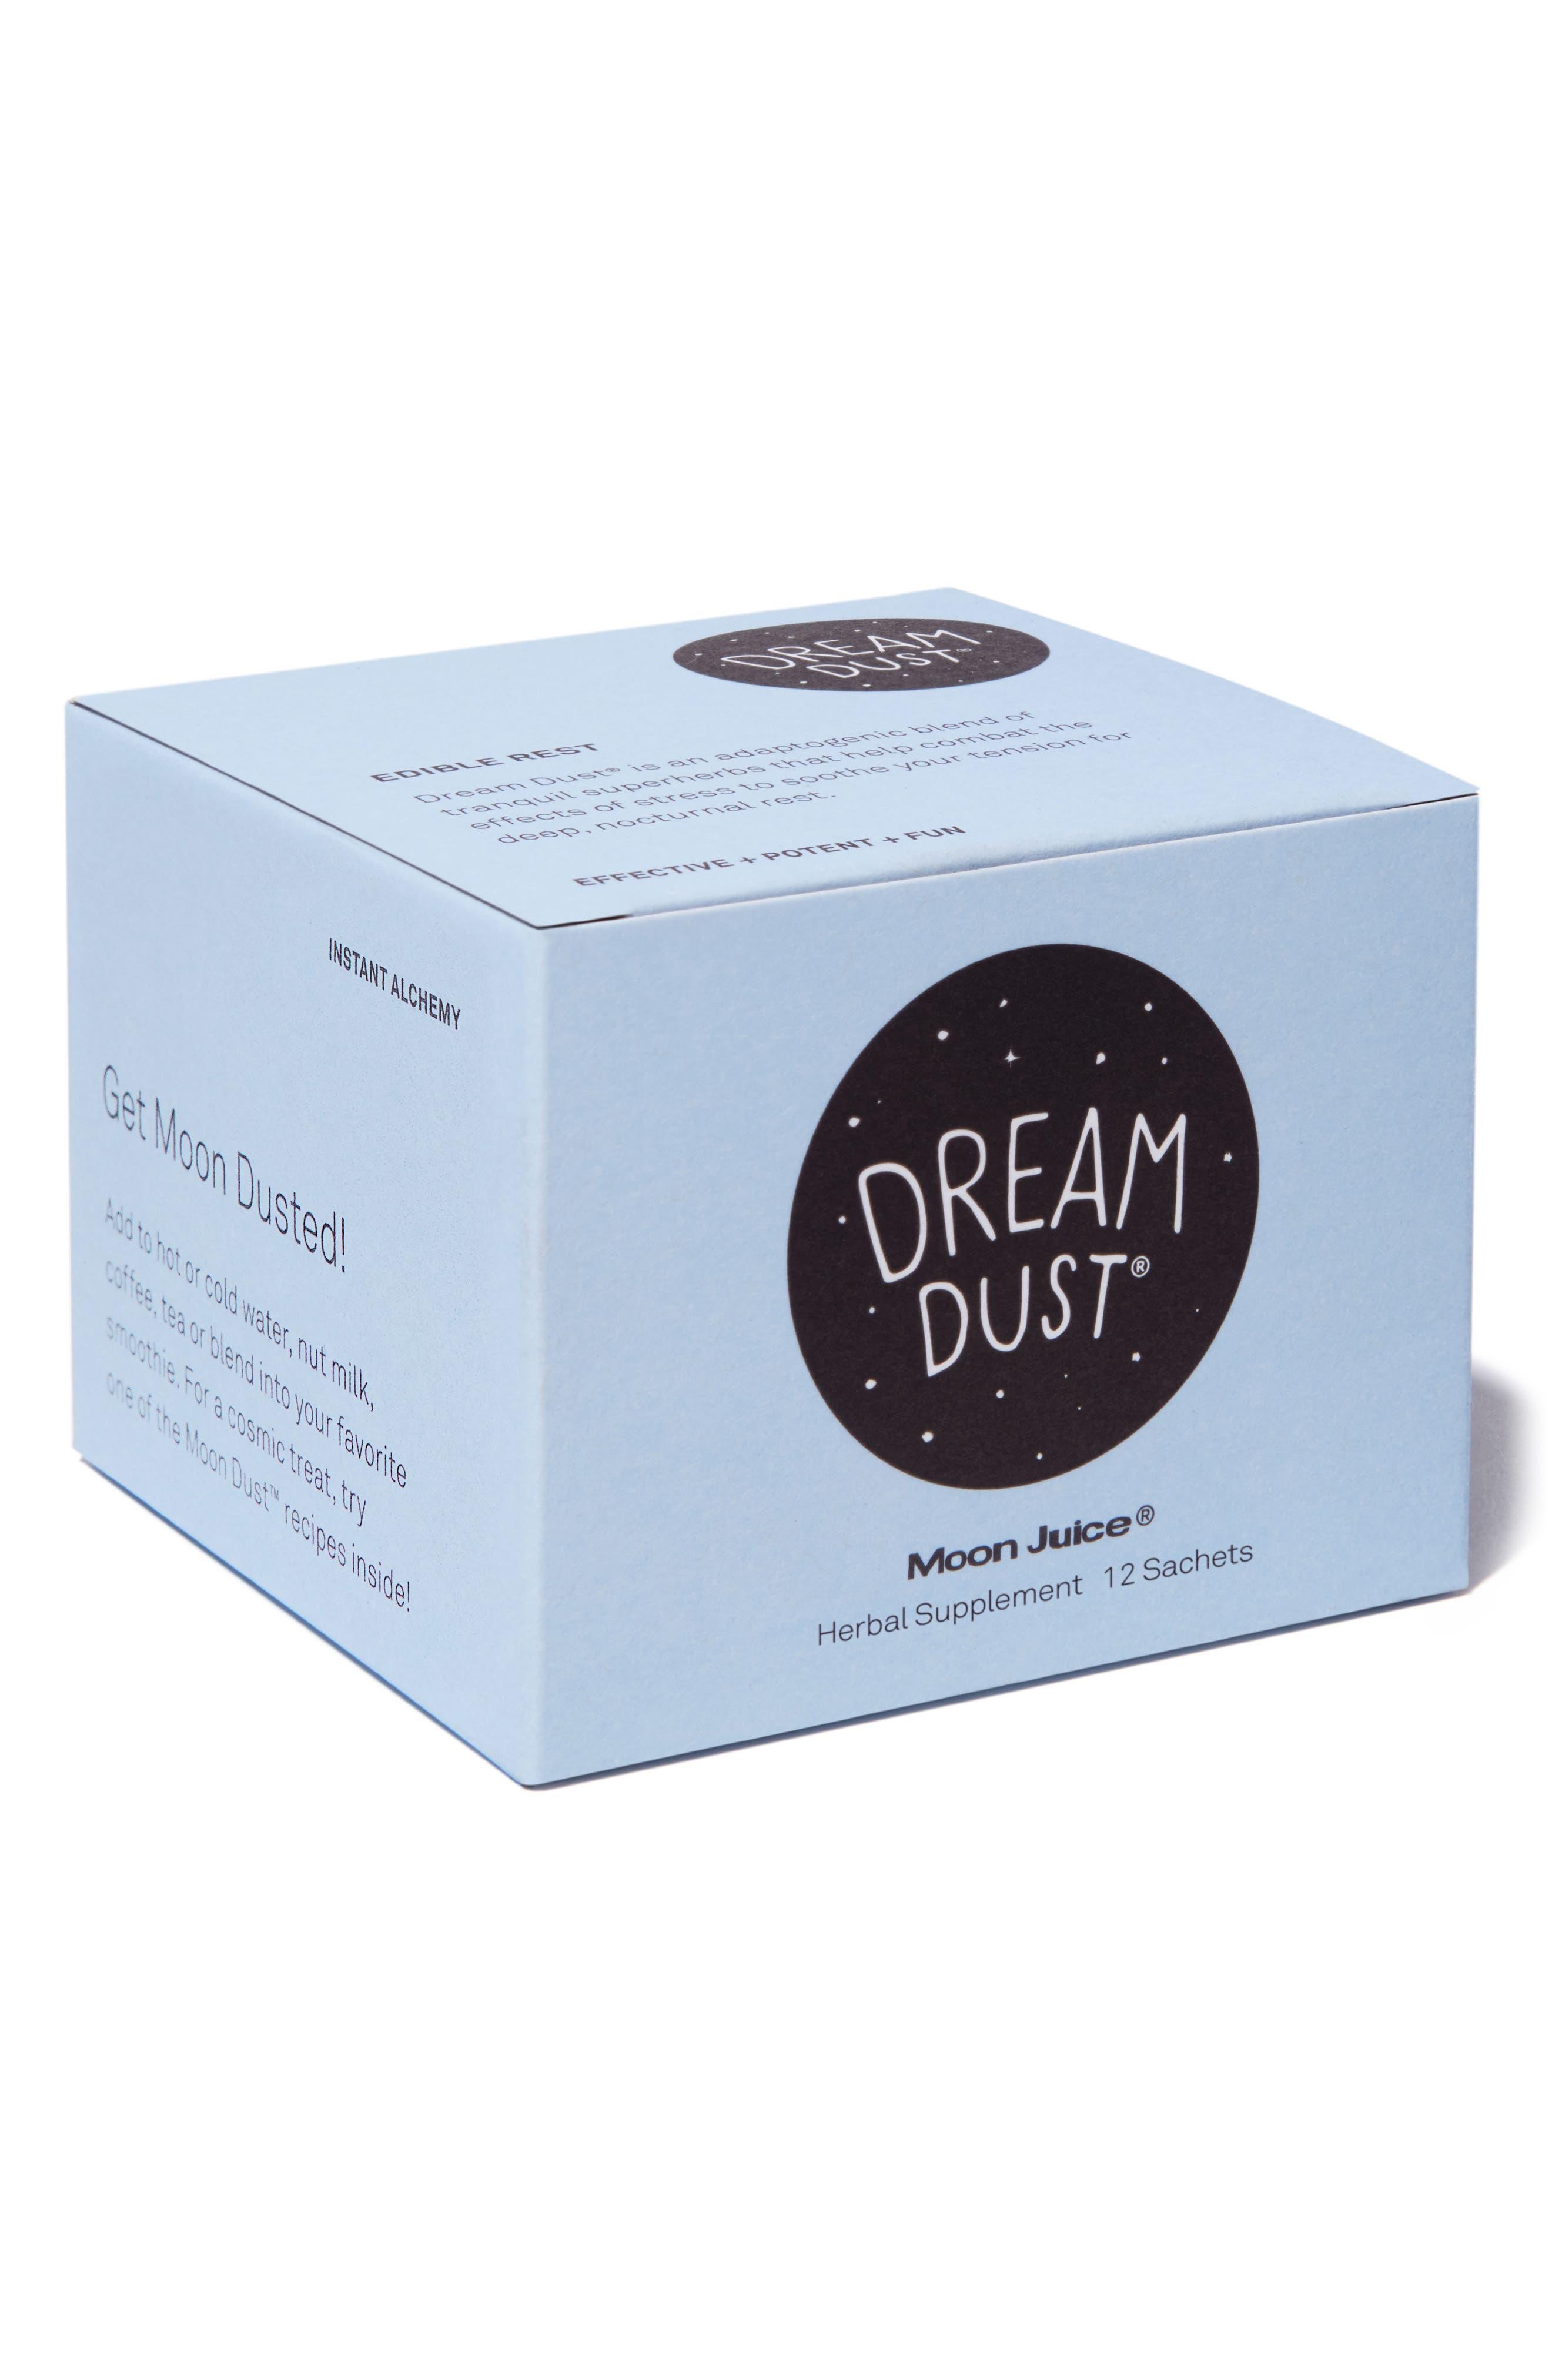 Moon Juice Dream Dust® 12-Pack Sachet Box